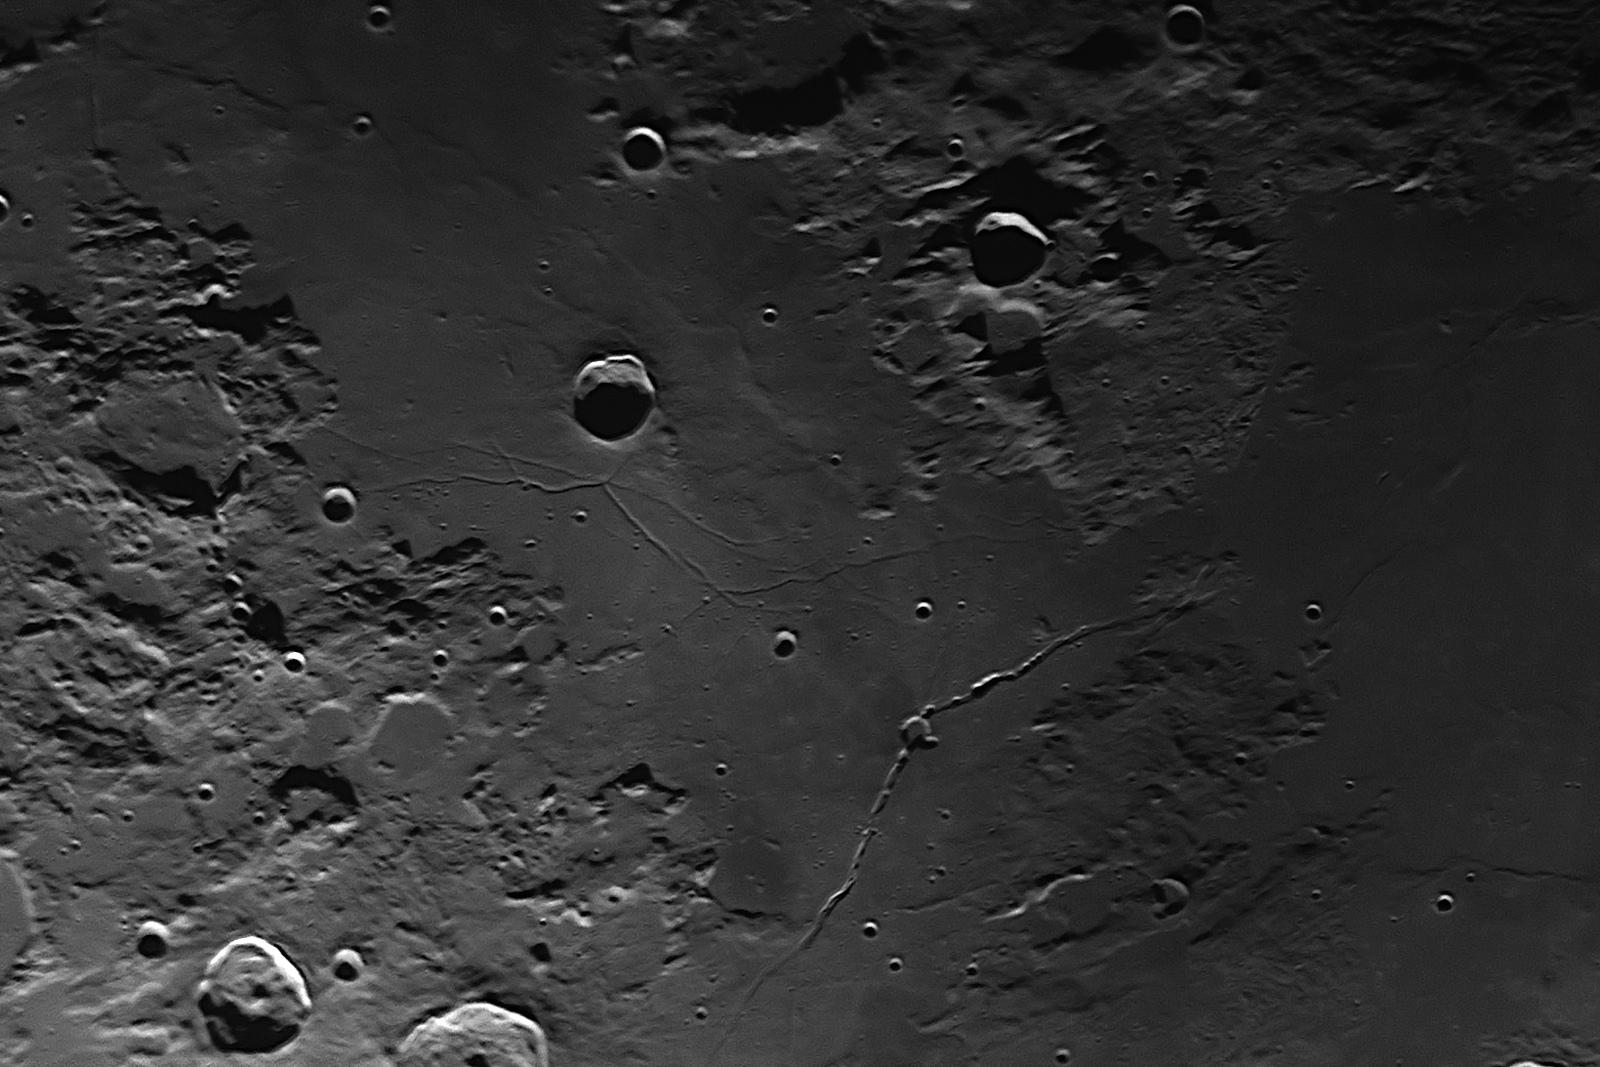 2019-12-04-2008_6-R-Moon.jpg.27a9eded1e0f37c355b46fde60c86122.jpg